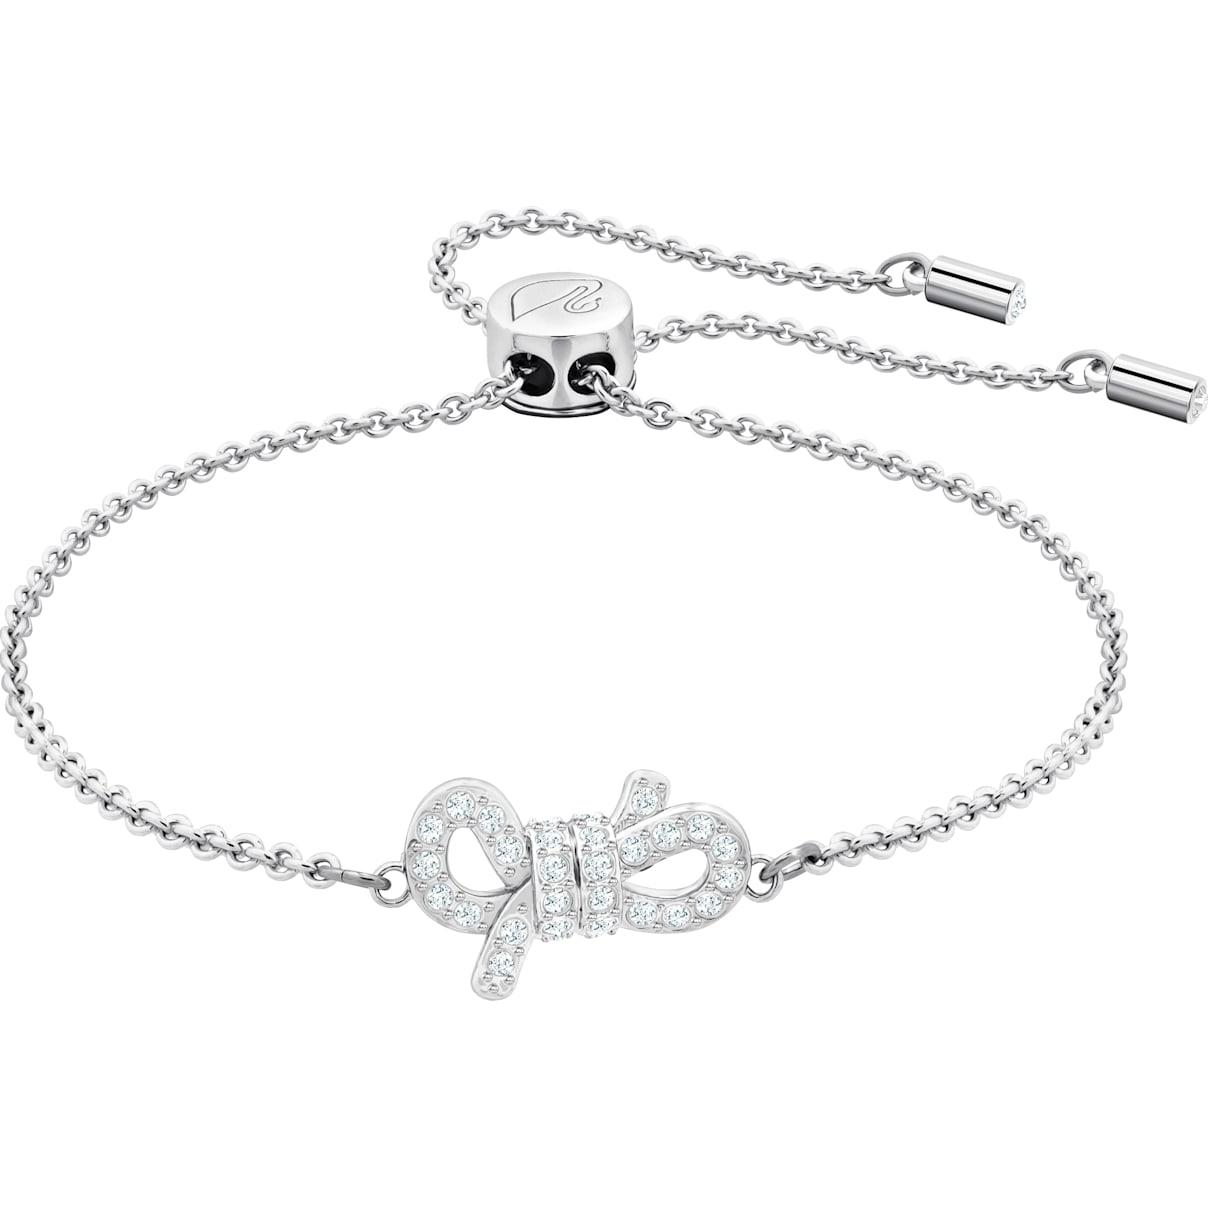 Swarovski Lifelong Bow Bracelet, White, Rhodium plated